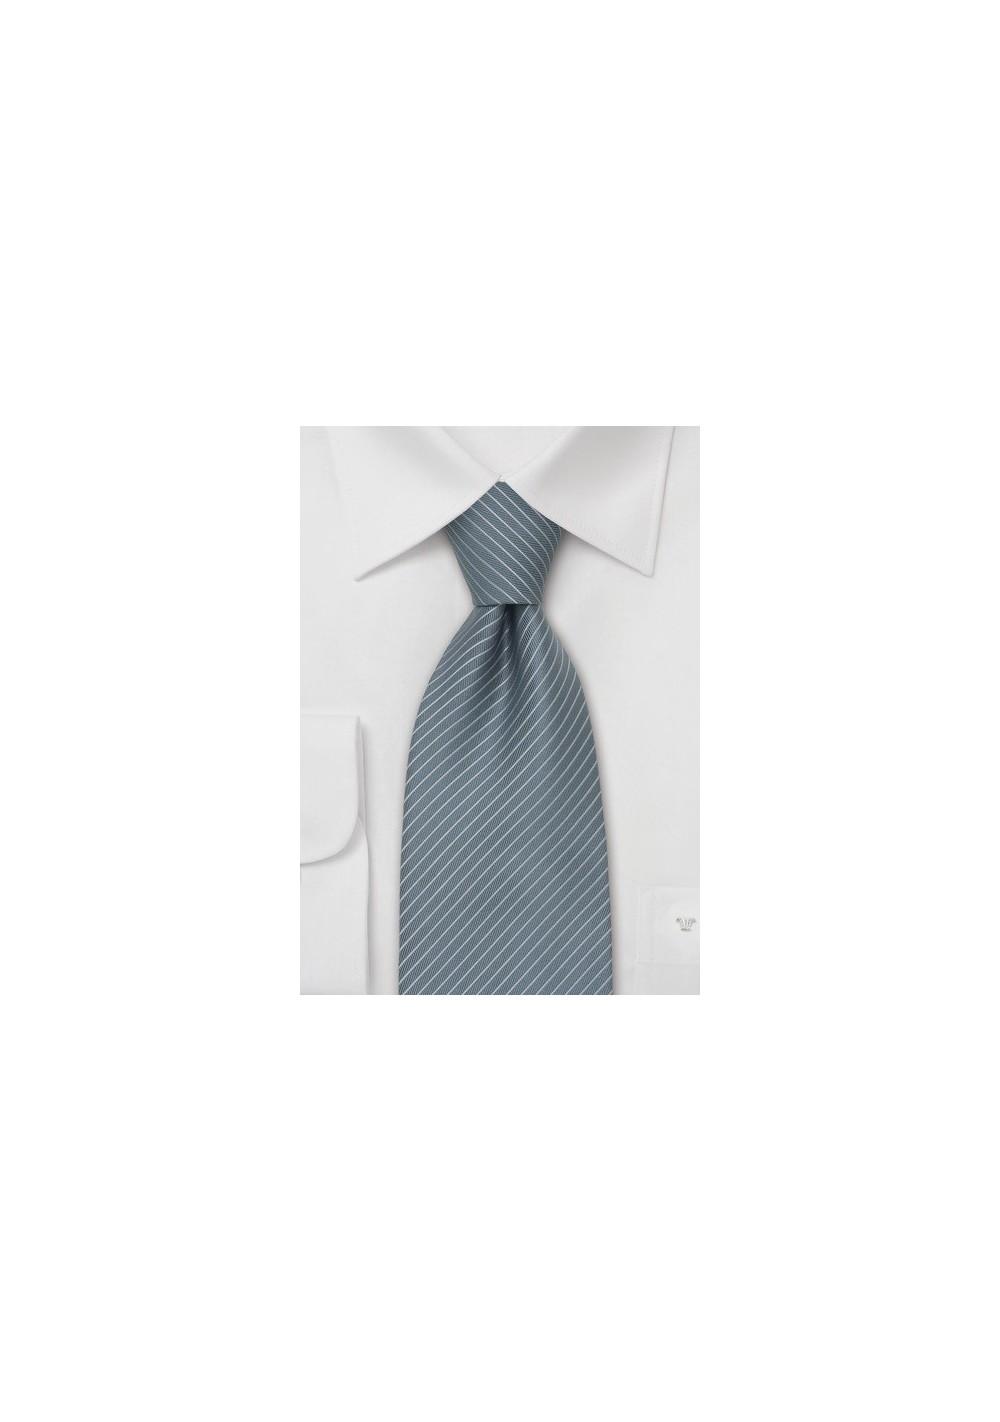 Gray Mens Ties - Fine Striped Tie in a Slate Gray Color